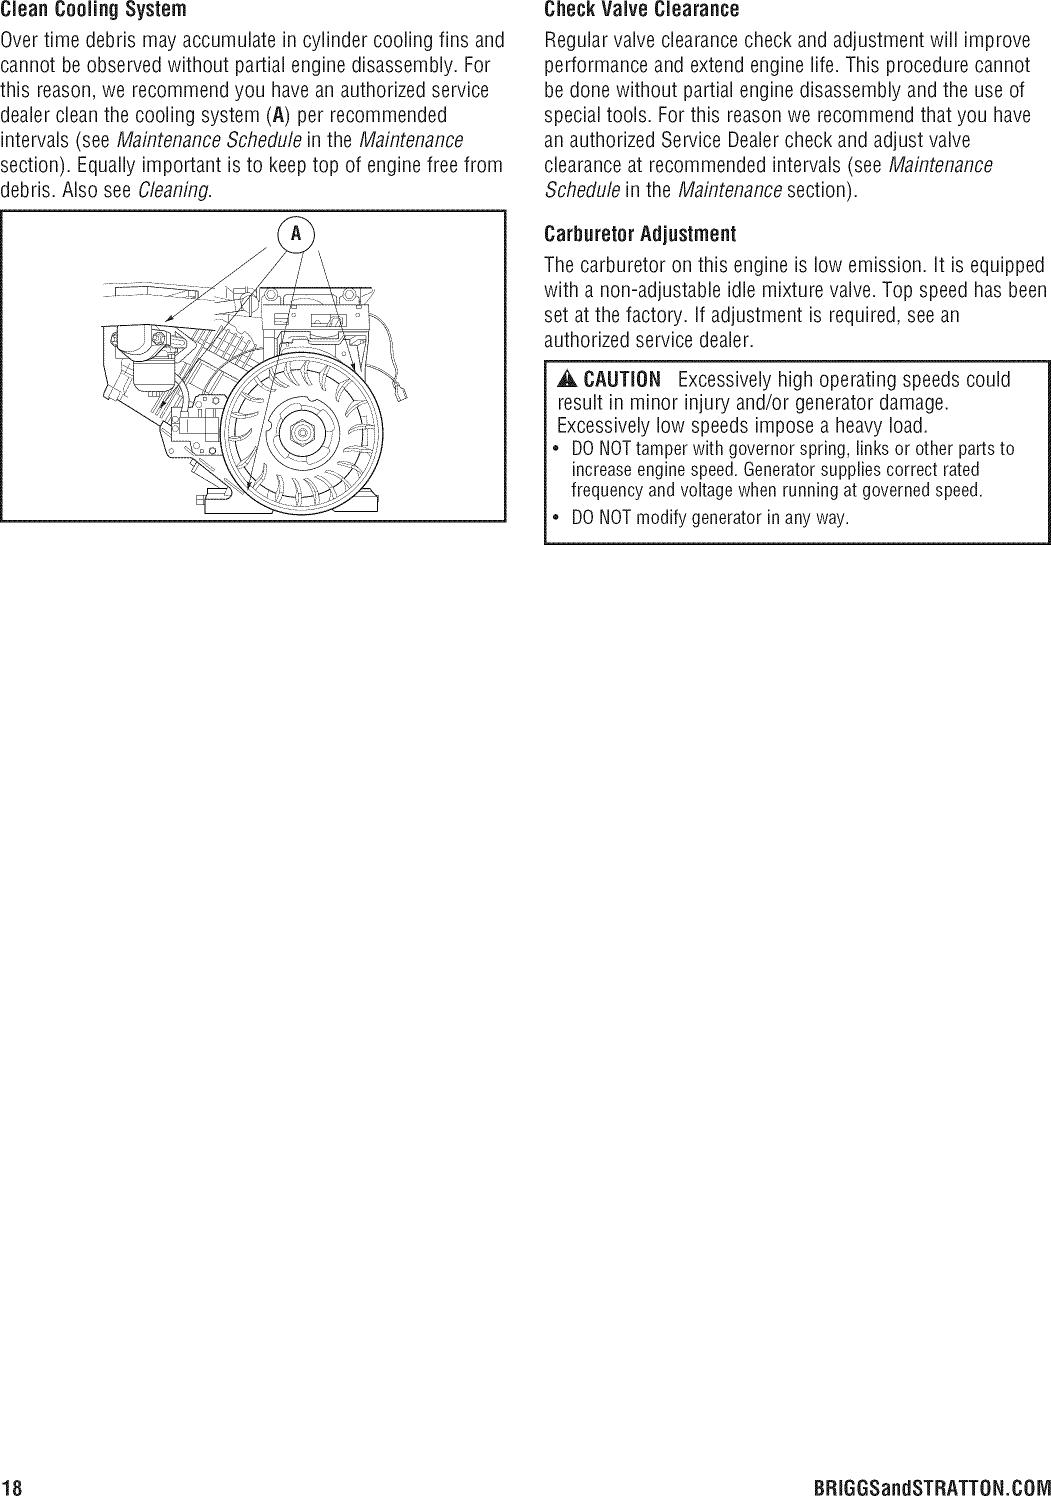 Briggs & Stratton 030430B 00 User Manual GENERATOR Manuals And